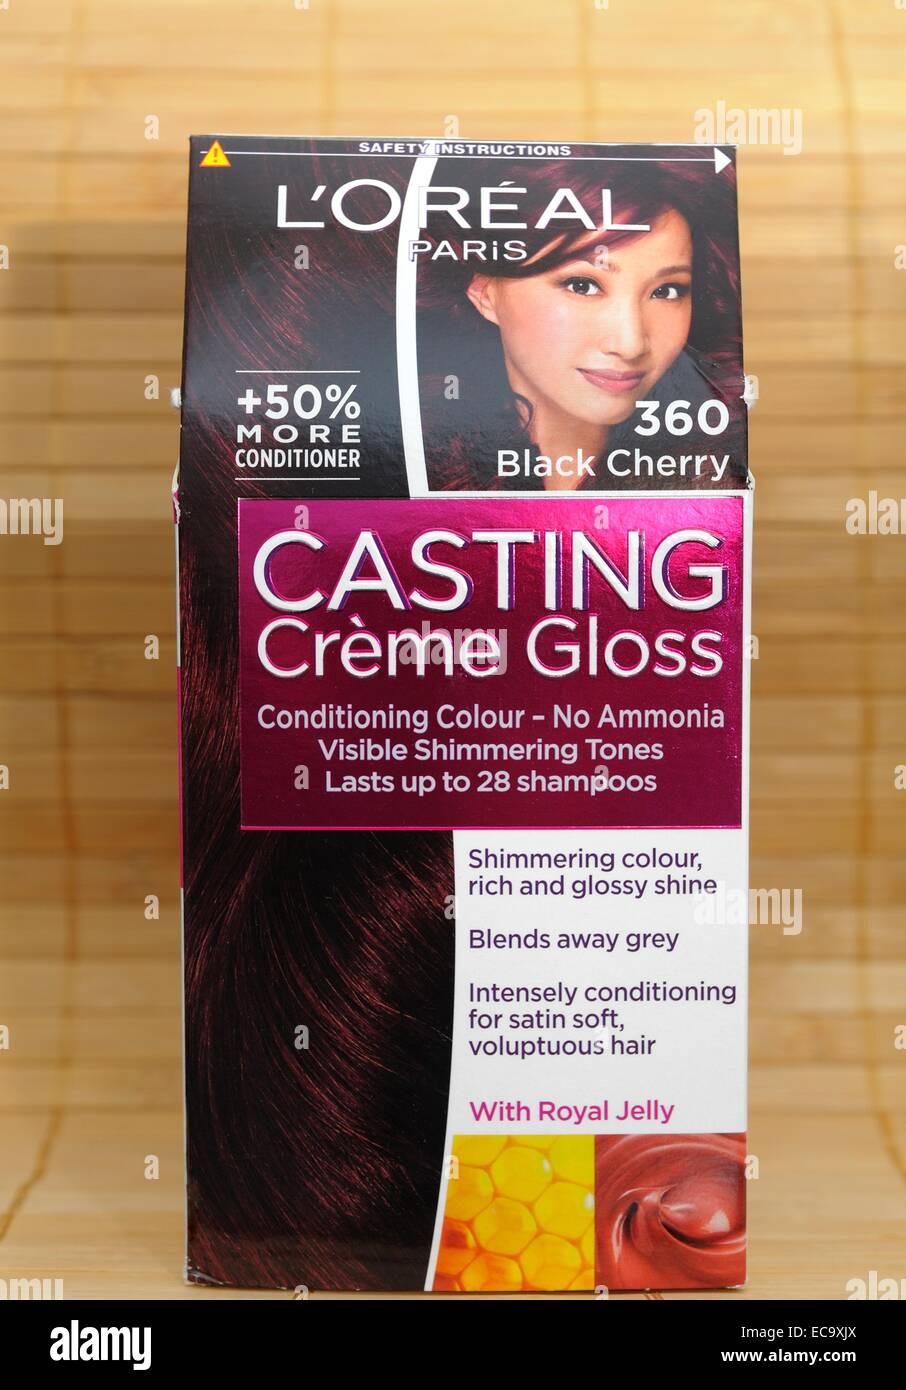 Loreal Black Cherry Casting Creme Gloss Hair Dye Stock Photo